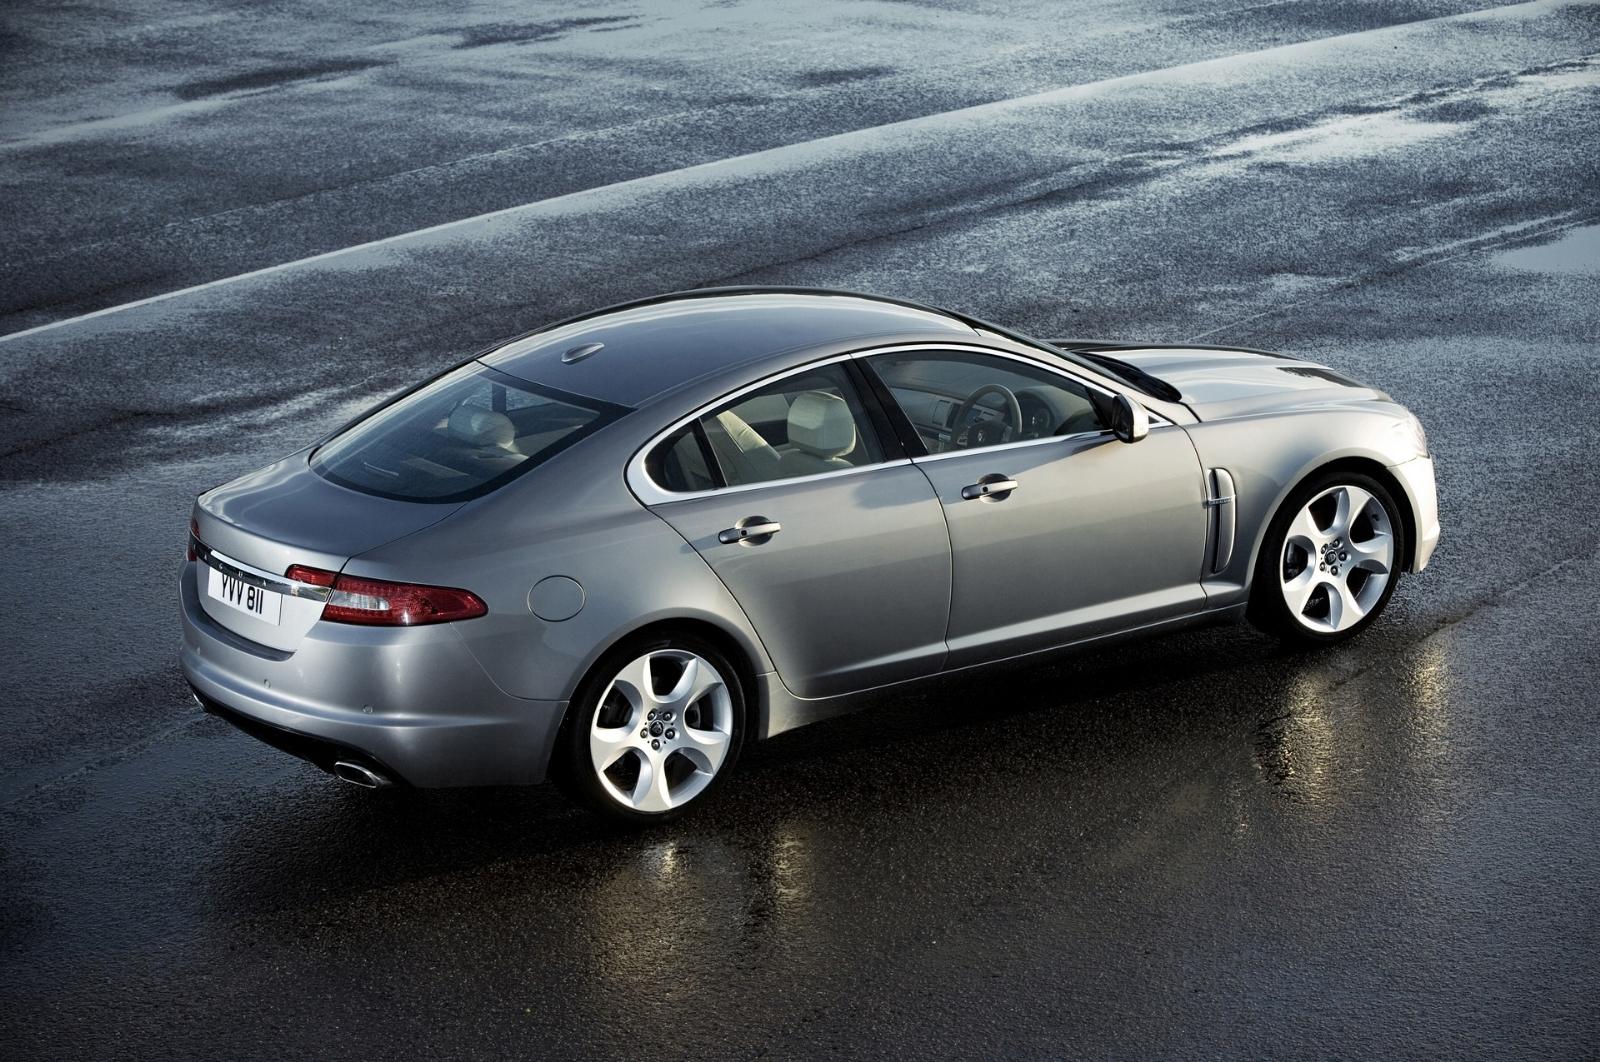 2009 Jaguar XF Image